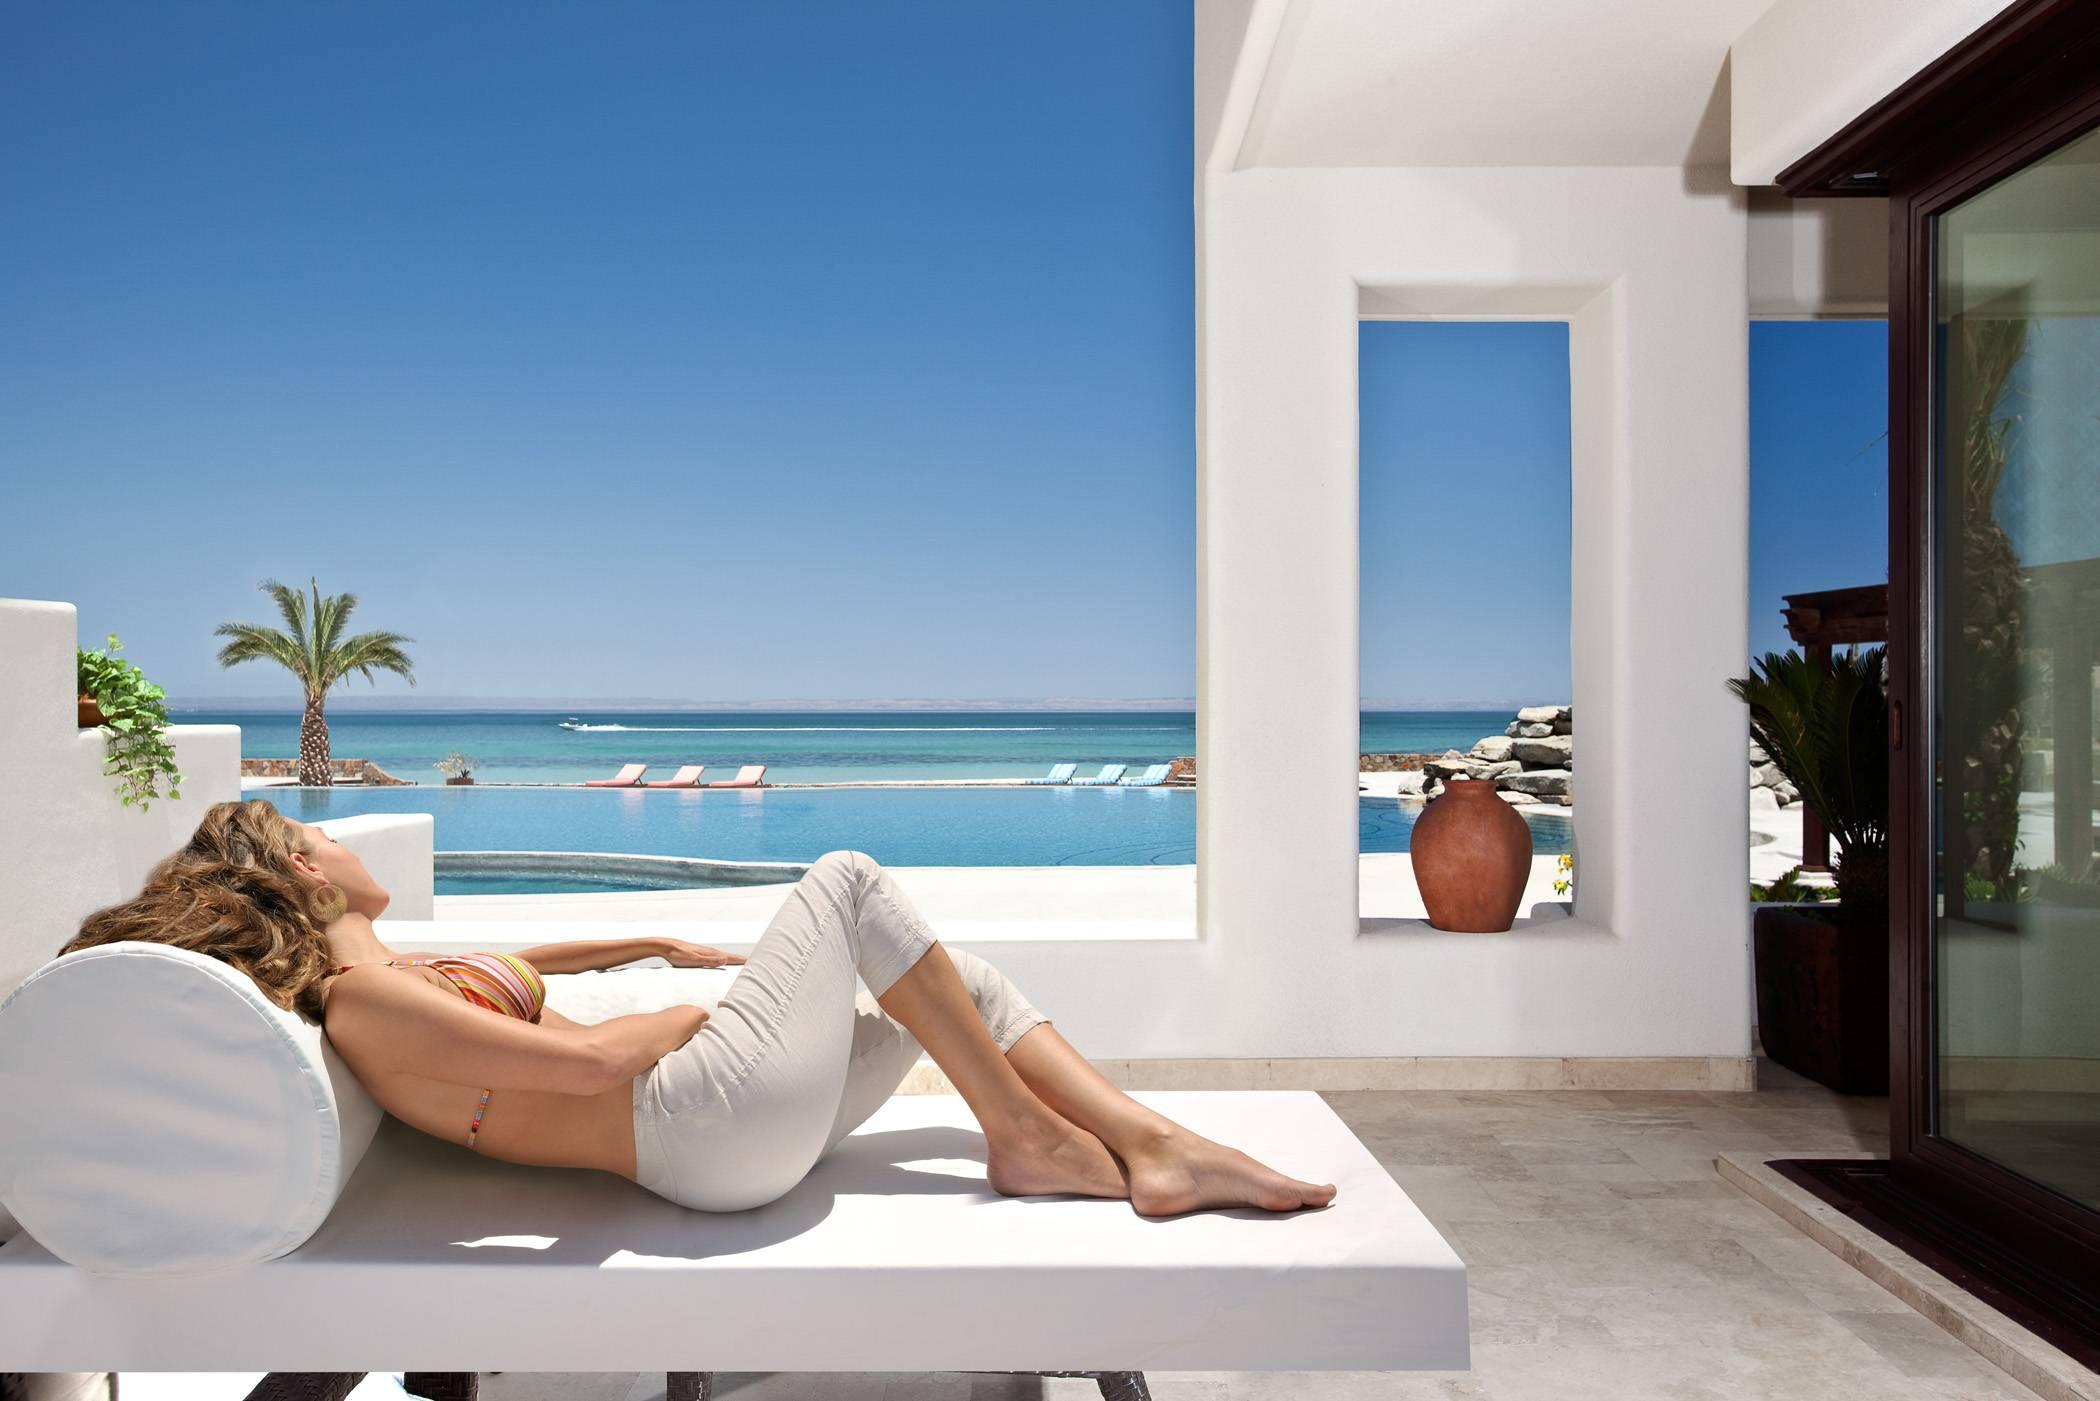 Jeffrey Curtiss Introduces Playa de La Paz Luxury Residences in